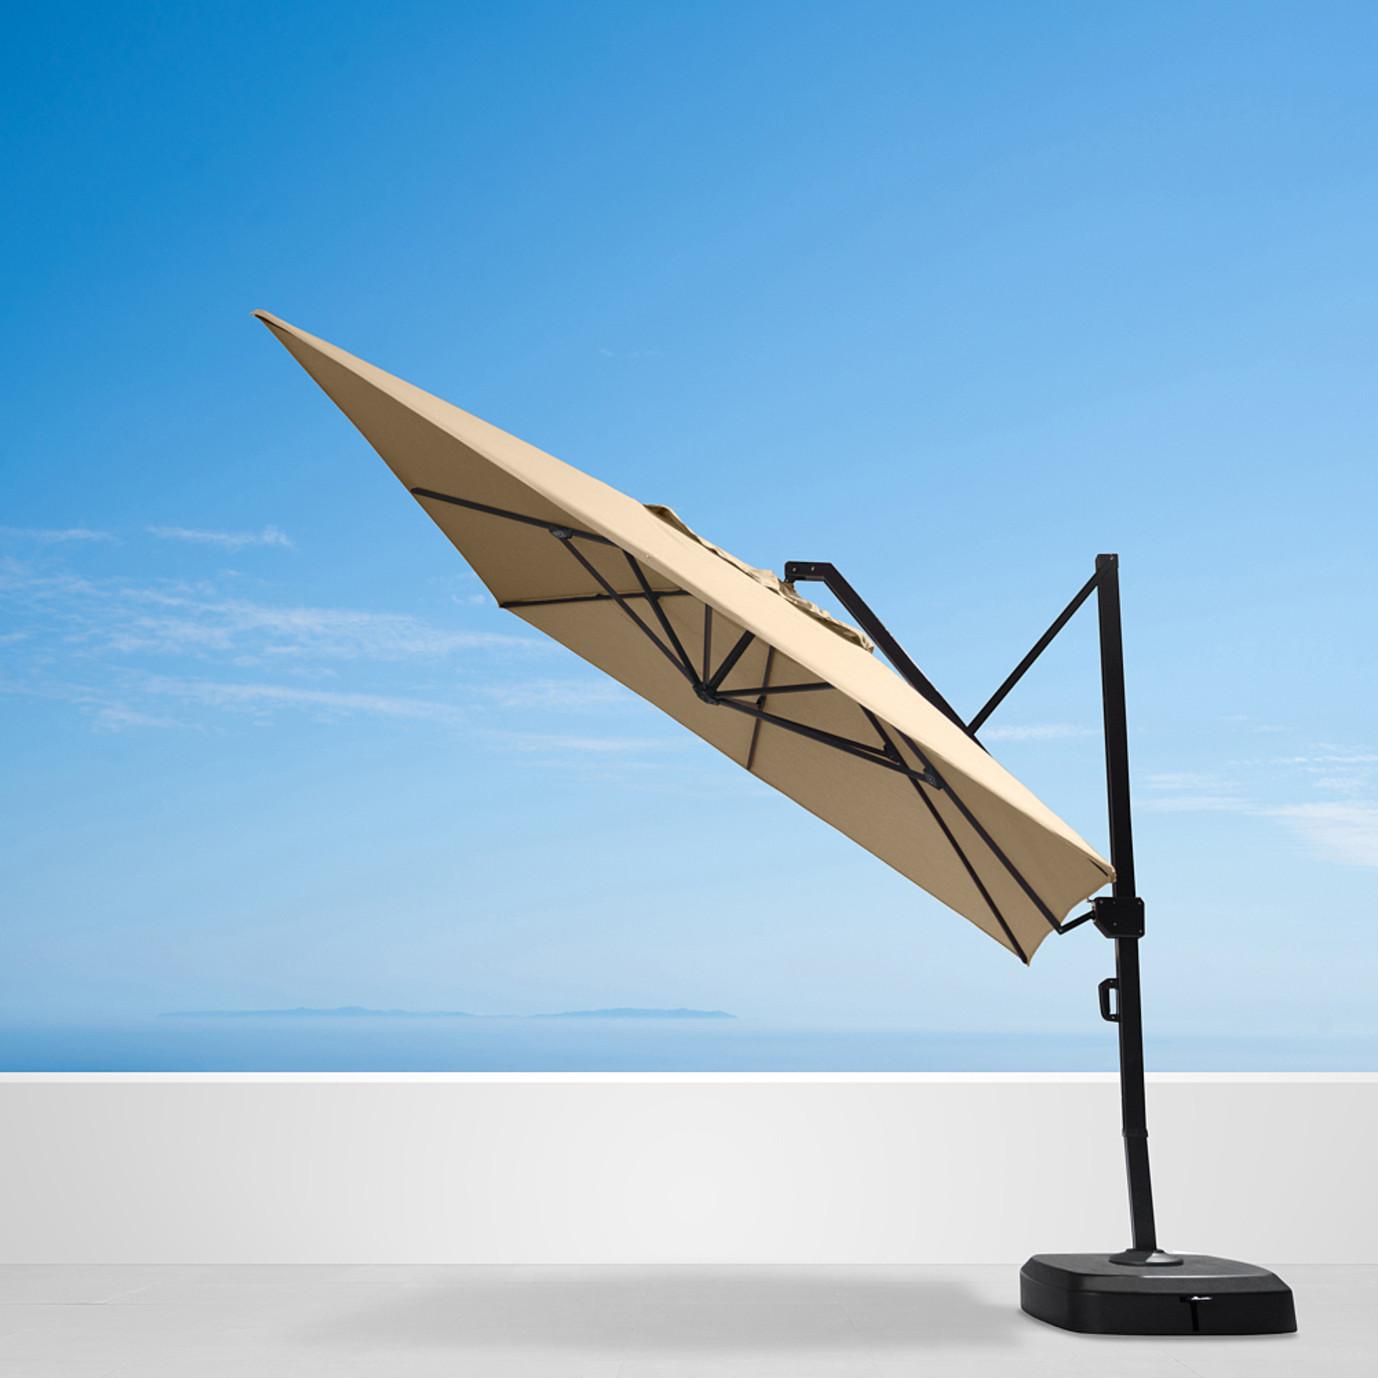 Portofino™ Commercial 12ft Umbrella - Heather Beige